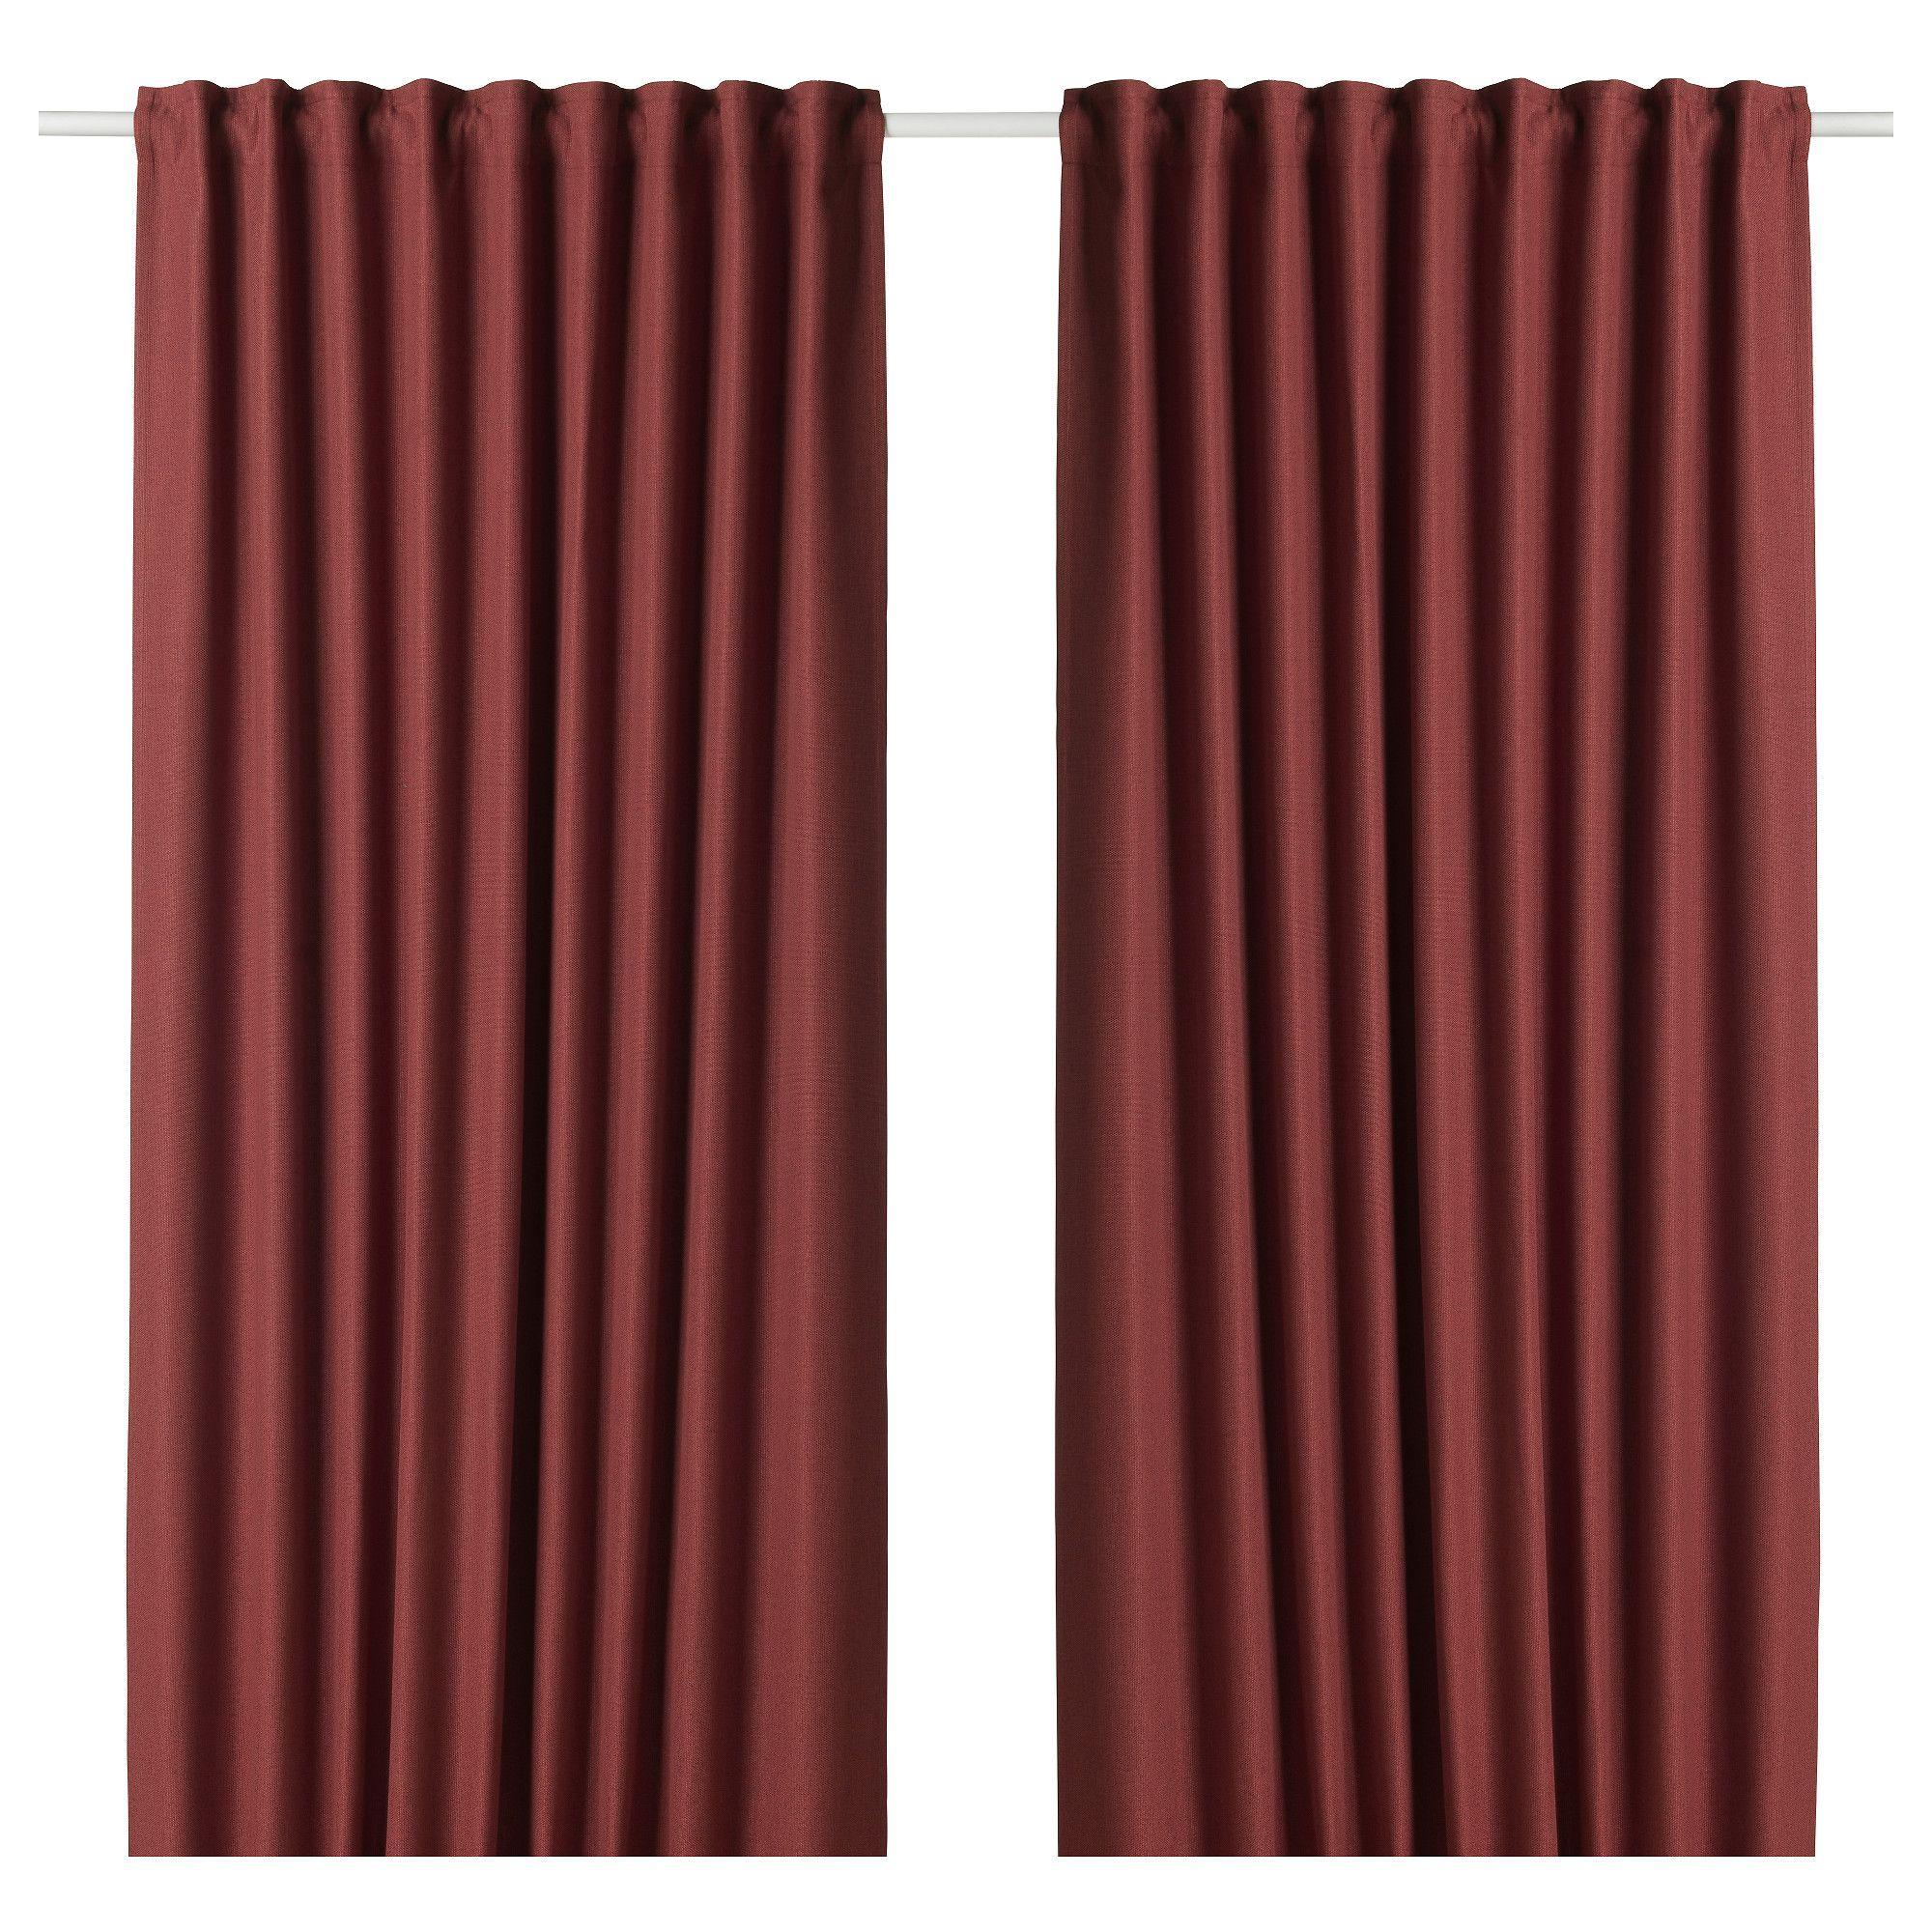 ANNAKAJSA Blackout Curtains 1 Pair